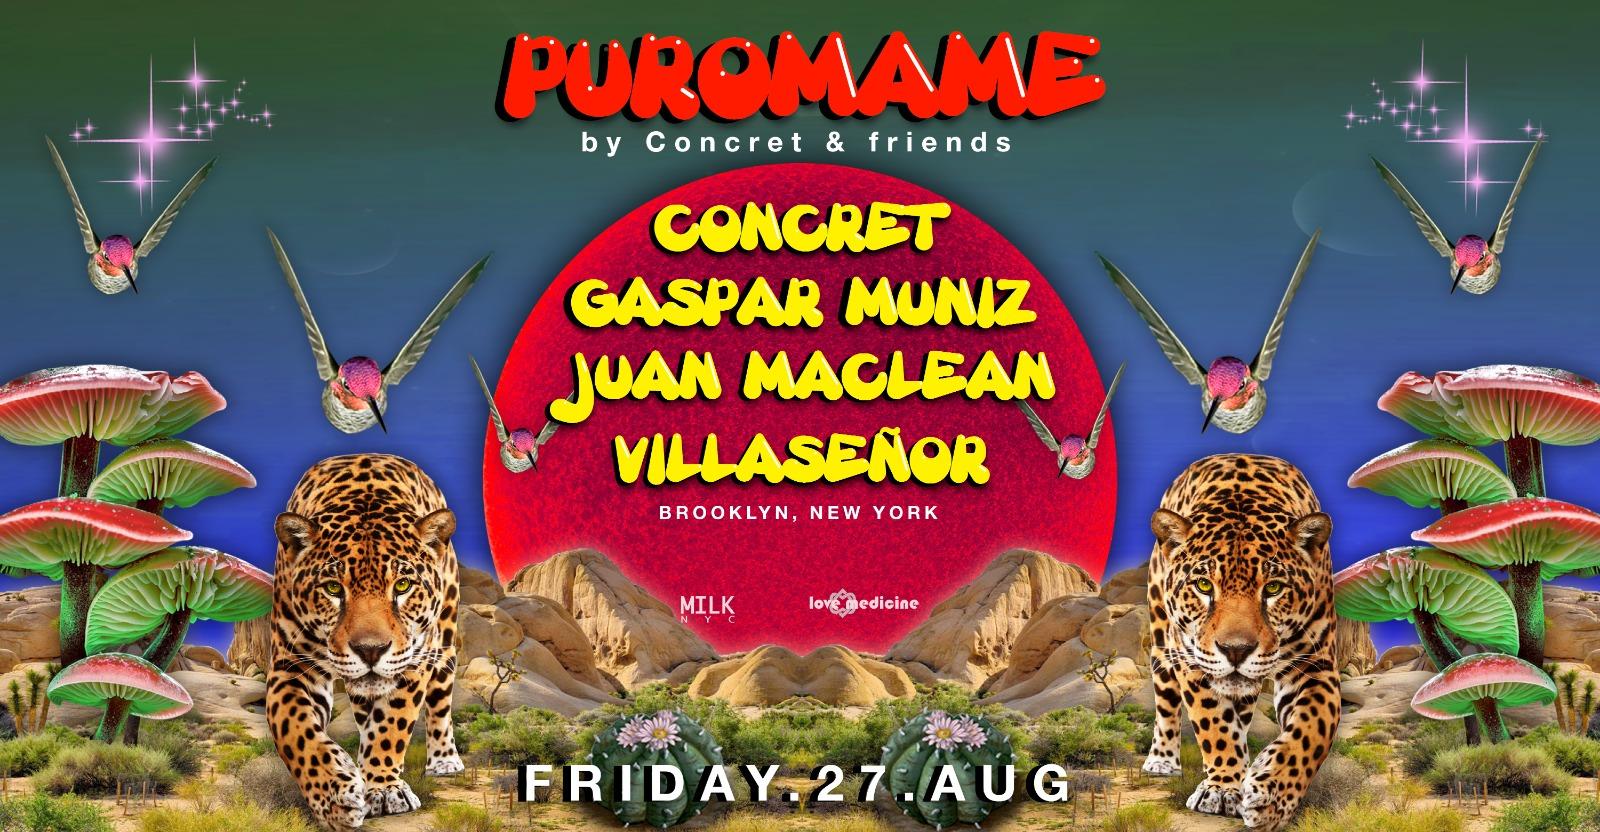 POSTPONED~PURO MAME ~ CONCRET, GASPAR MUNIZ, JUAN MACLEAN, VILLASEÑOR